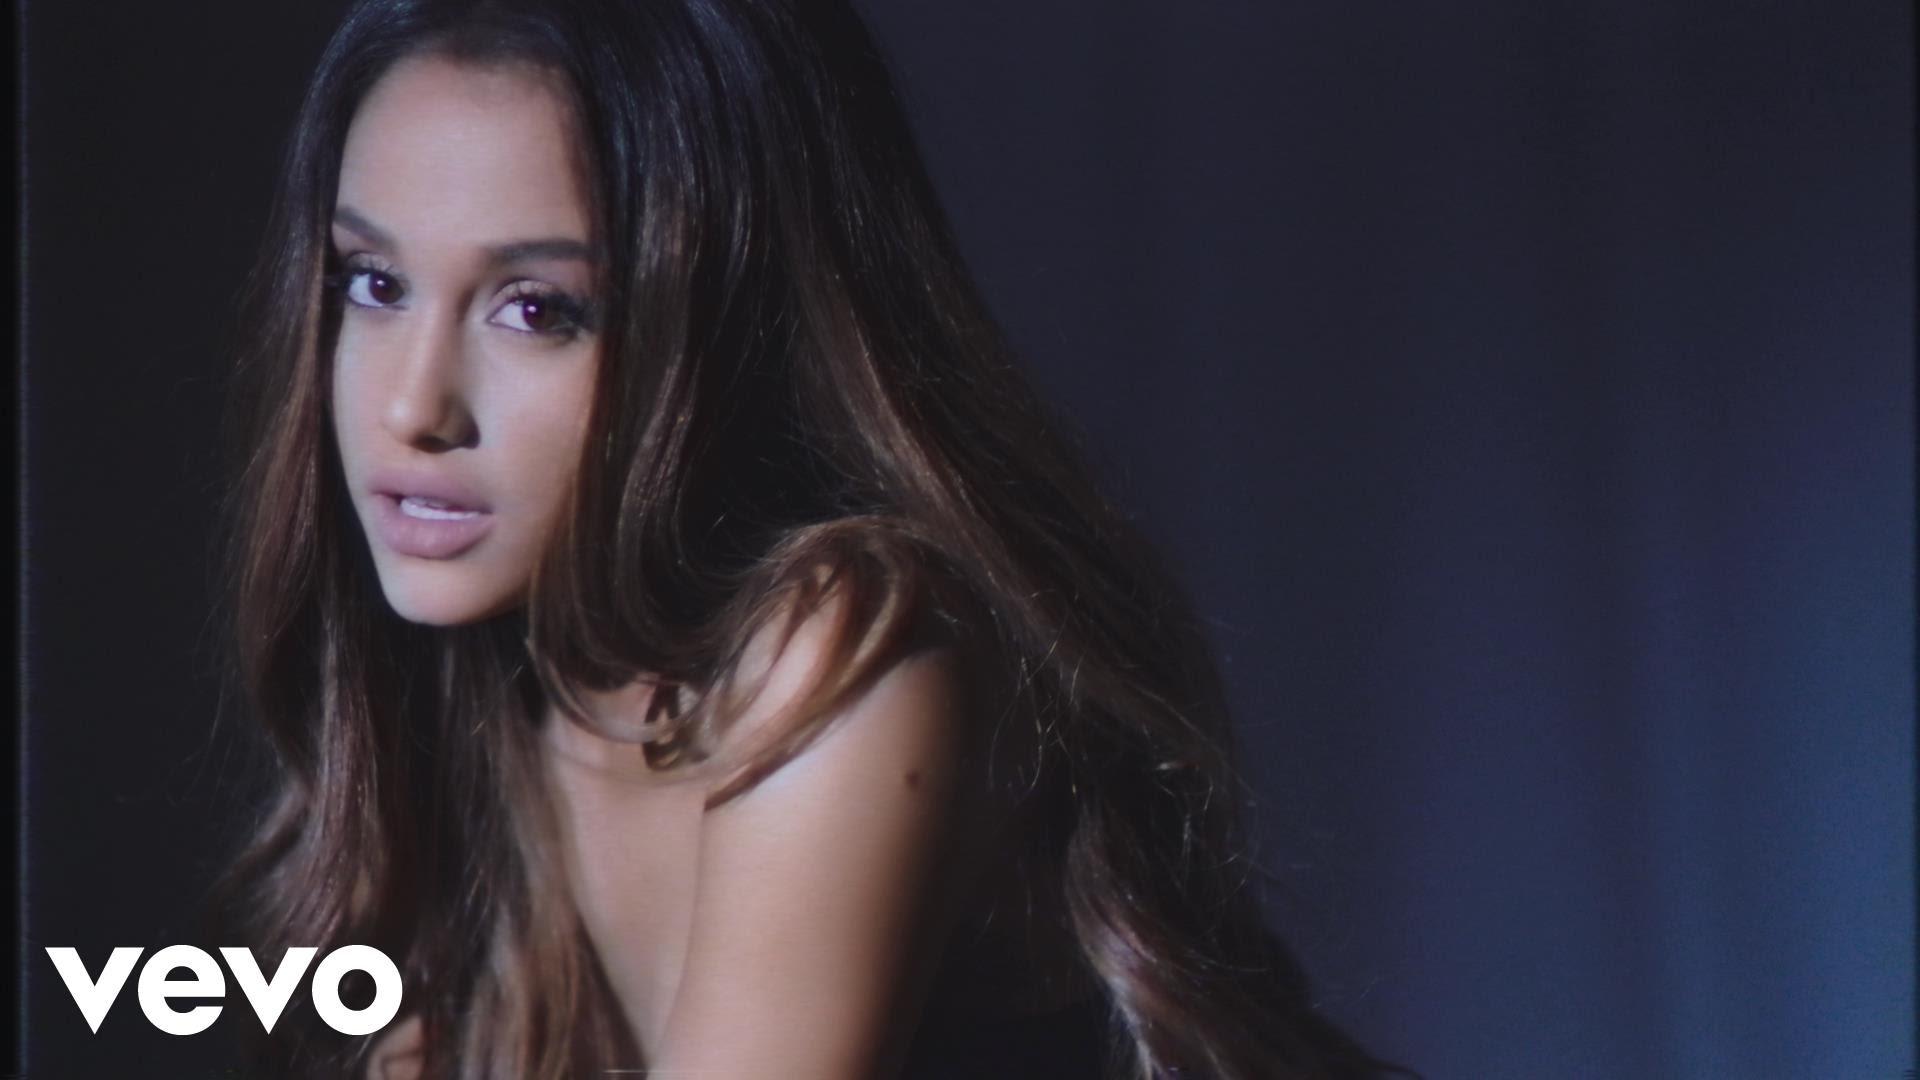 Ariana Grande — Dangerous Woman